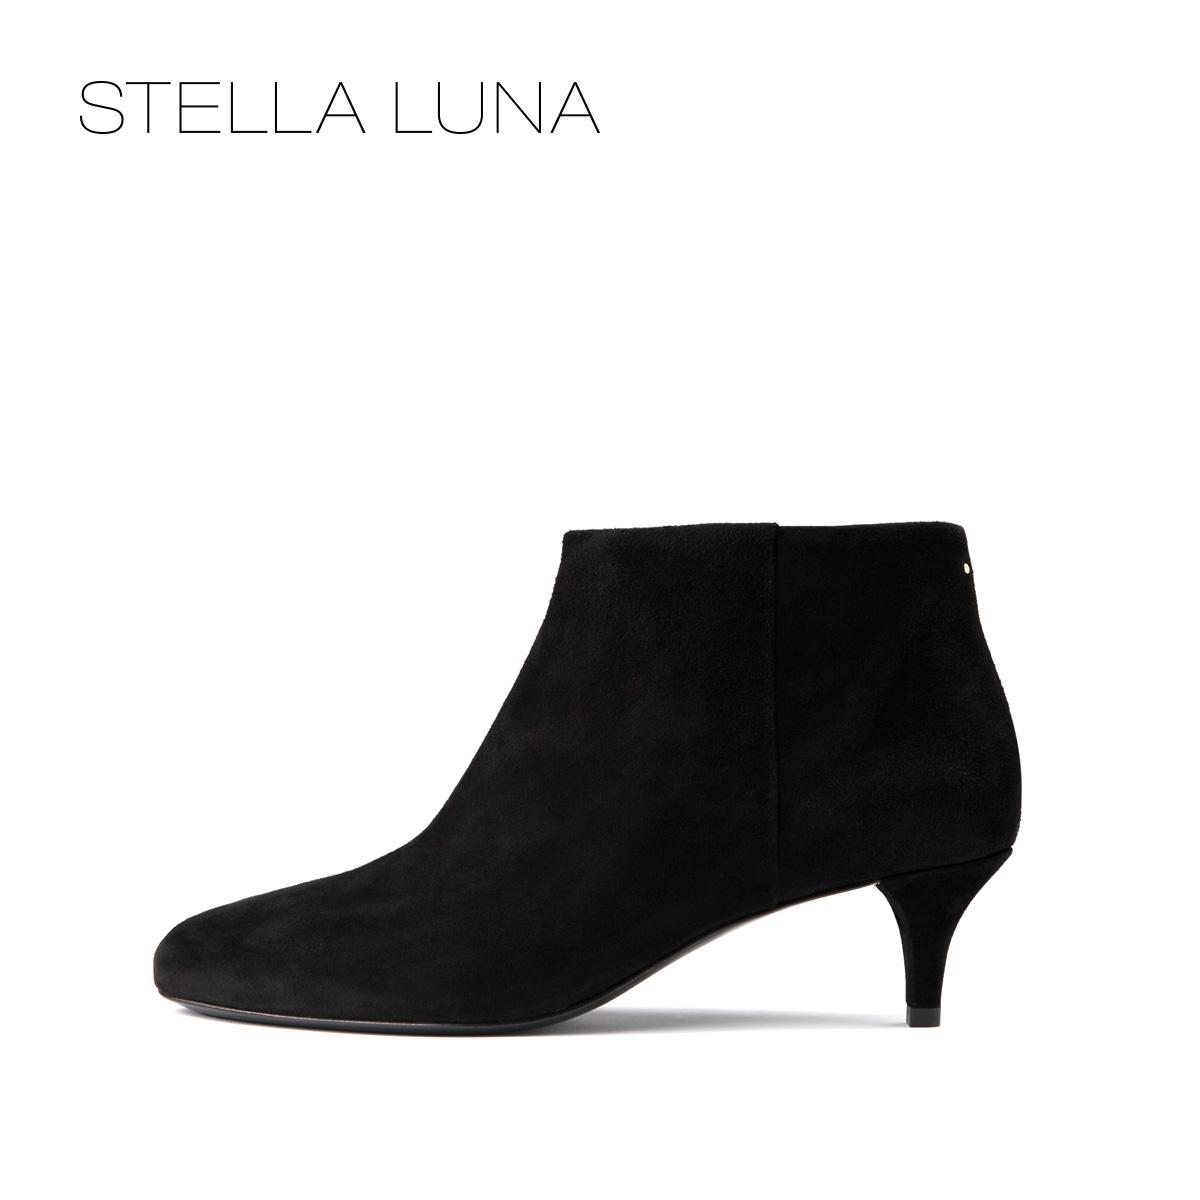 STELLA LUNA女靴冬季中跟圆头短靴女简约靴子SG320C02037